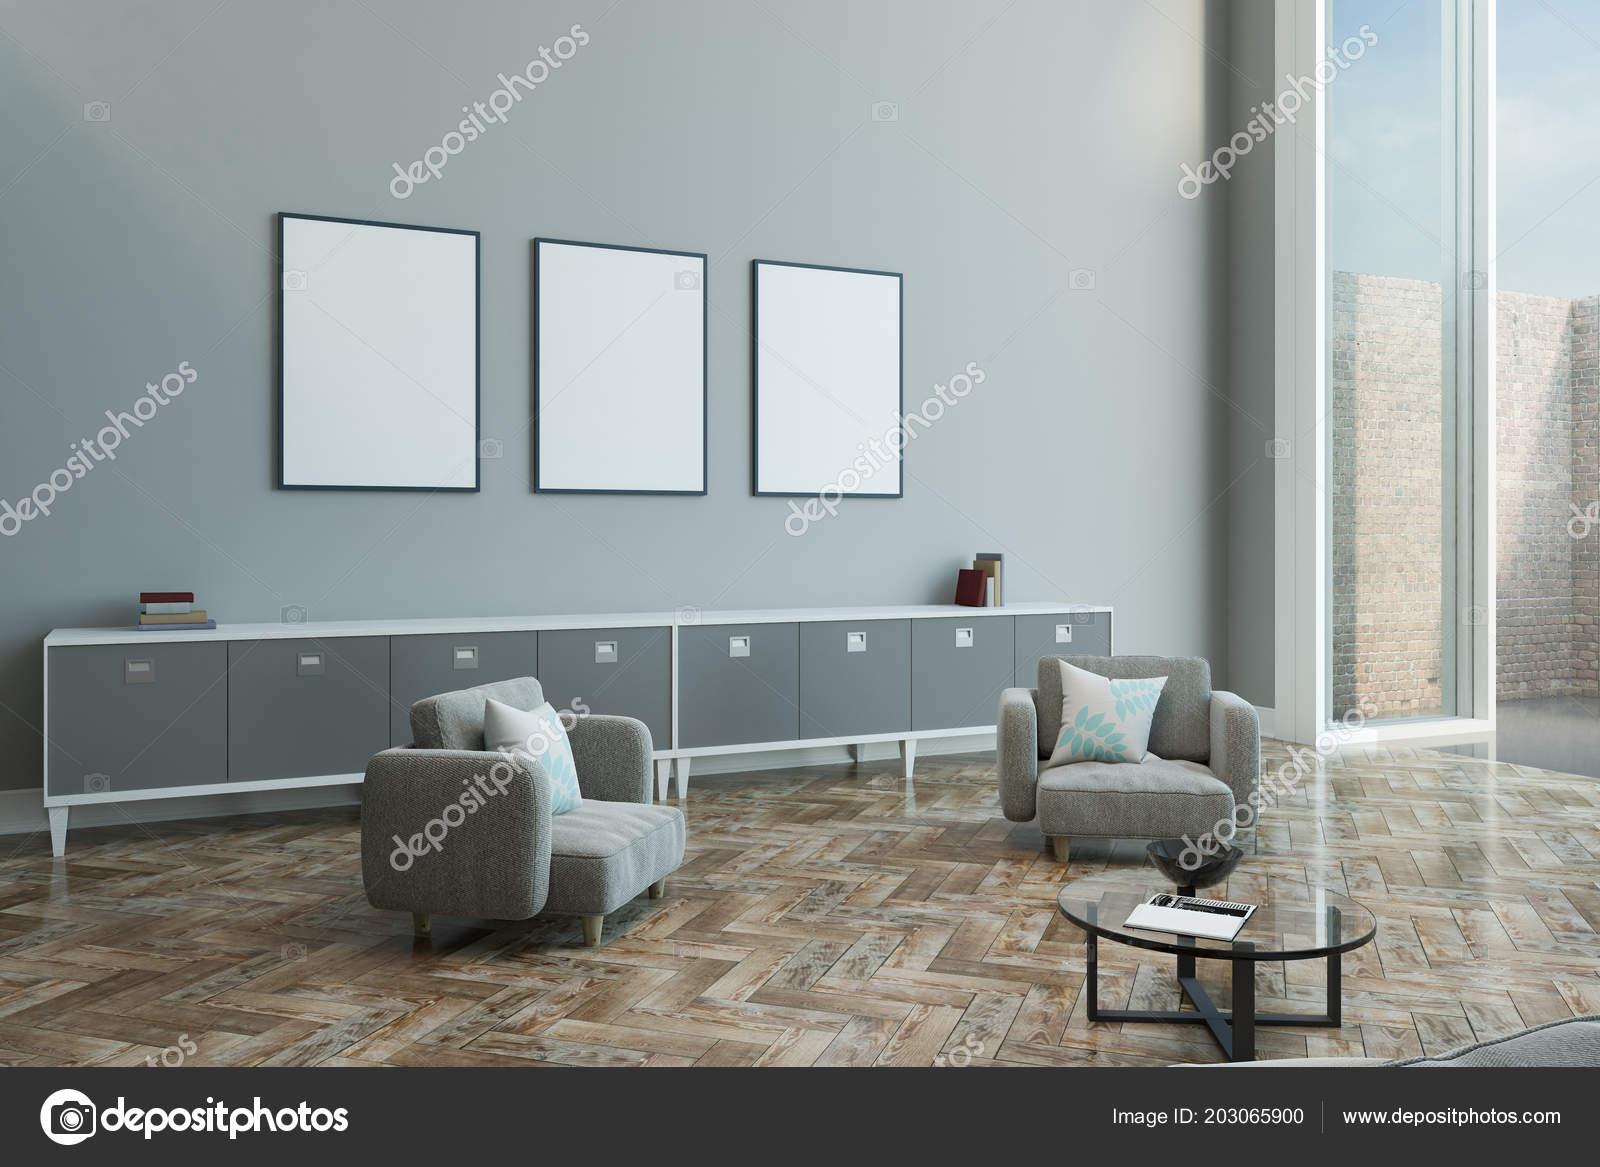 Grey Wooden Floor Living Room Three Blank Posters Light Grey Wall Modern Living Room Wooden Stock Photo C Peshkova 203065900